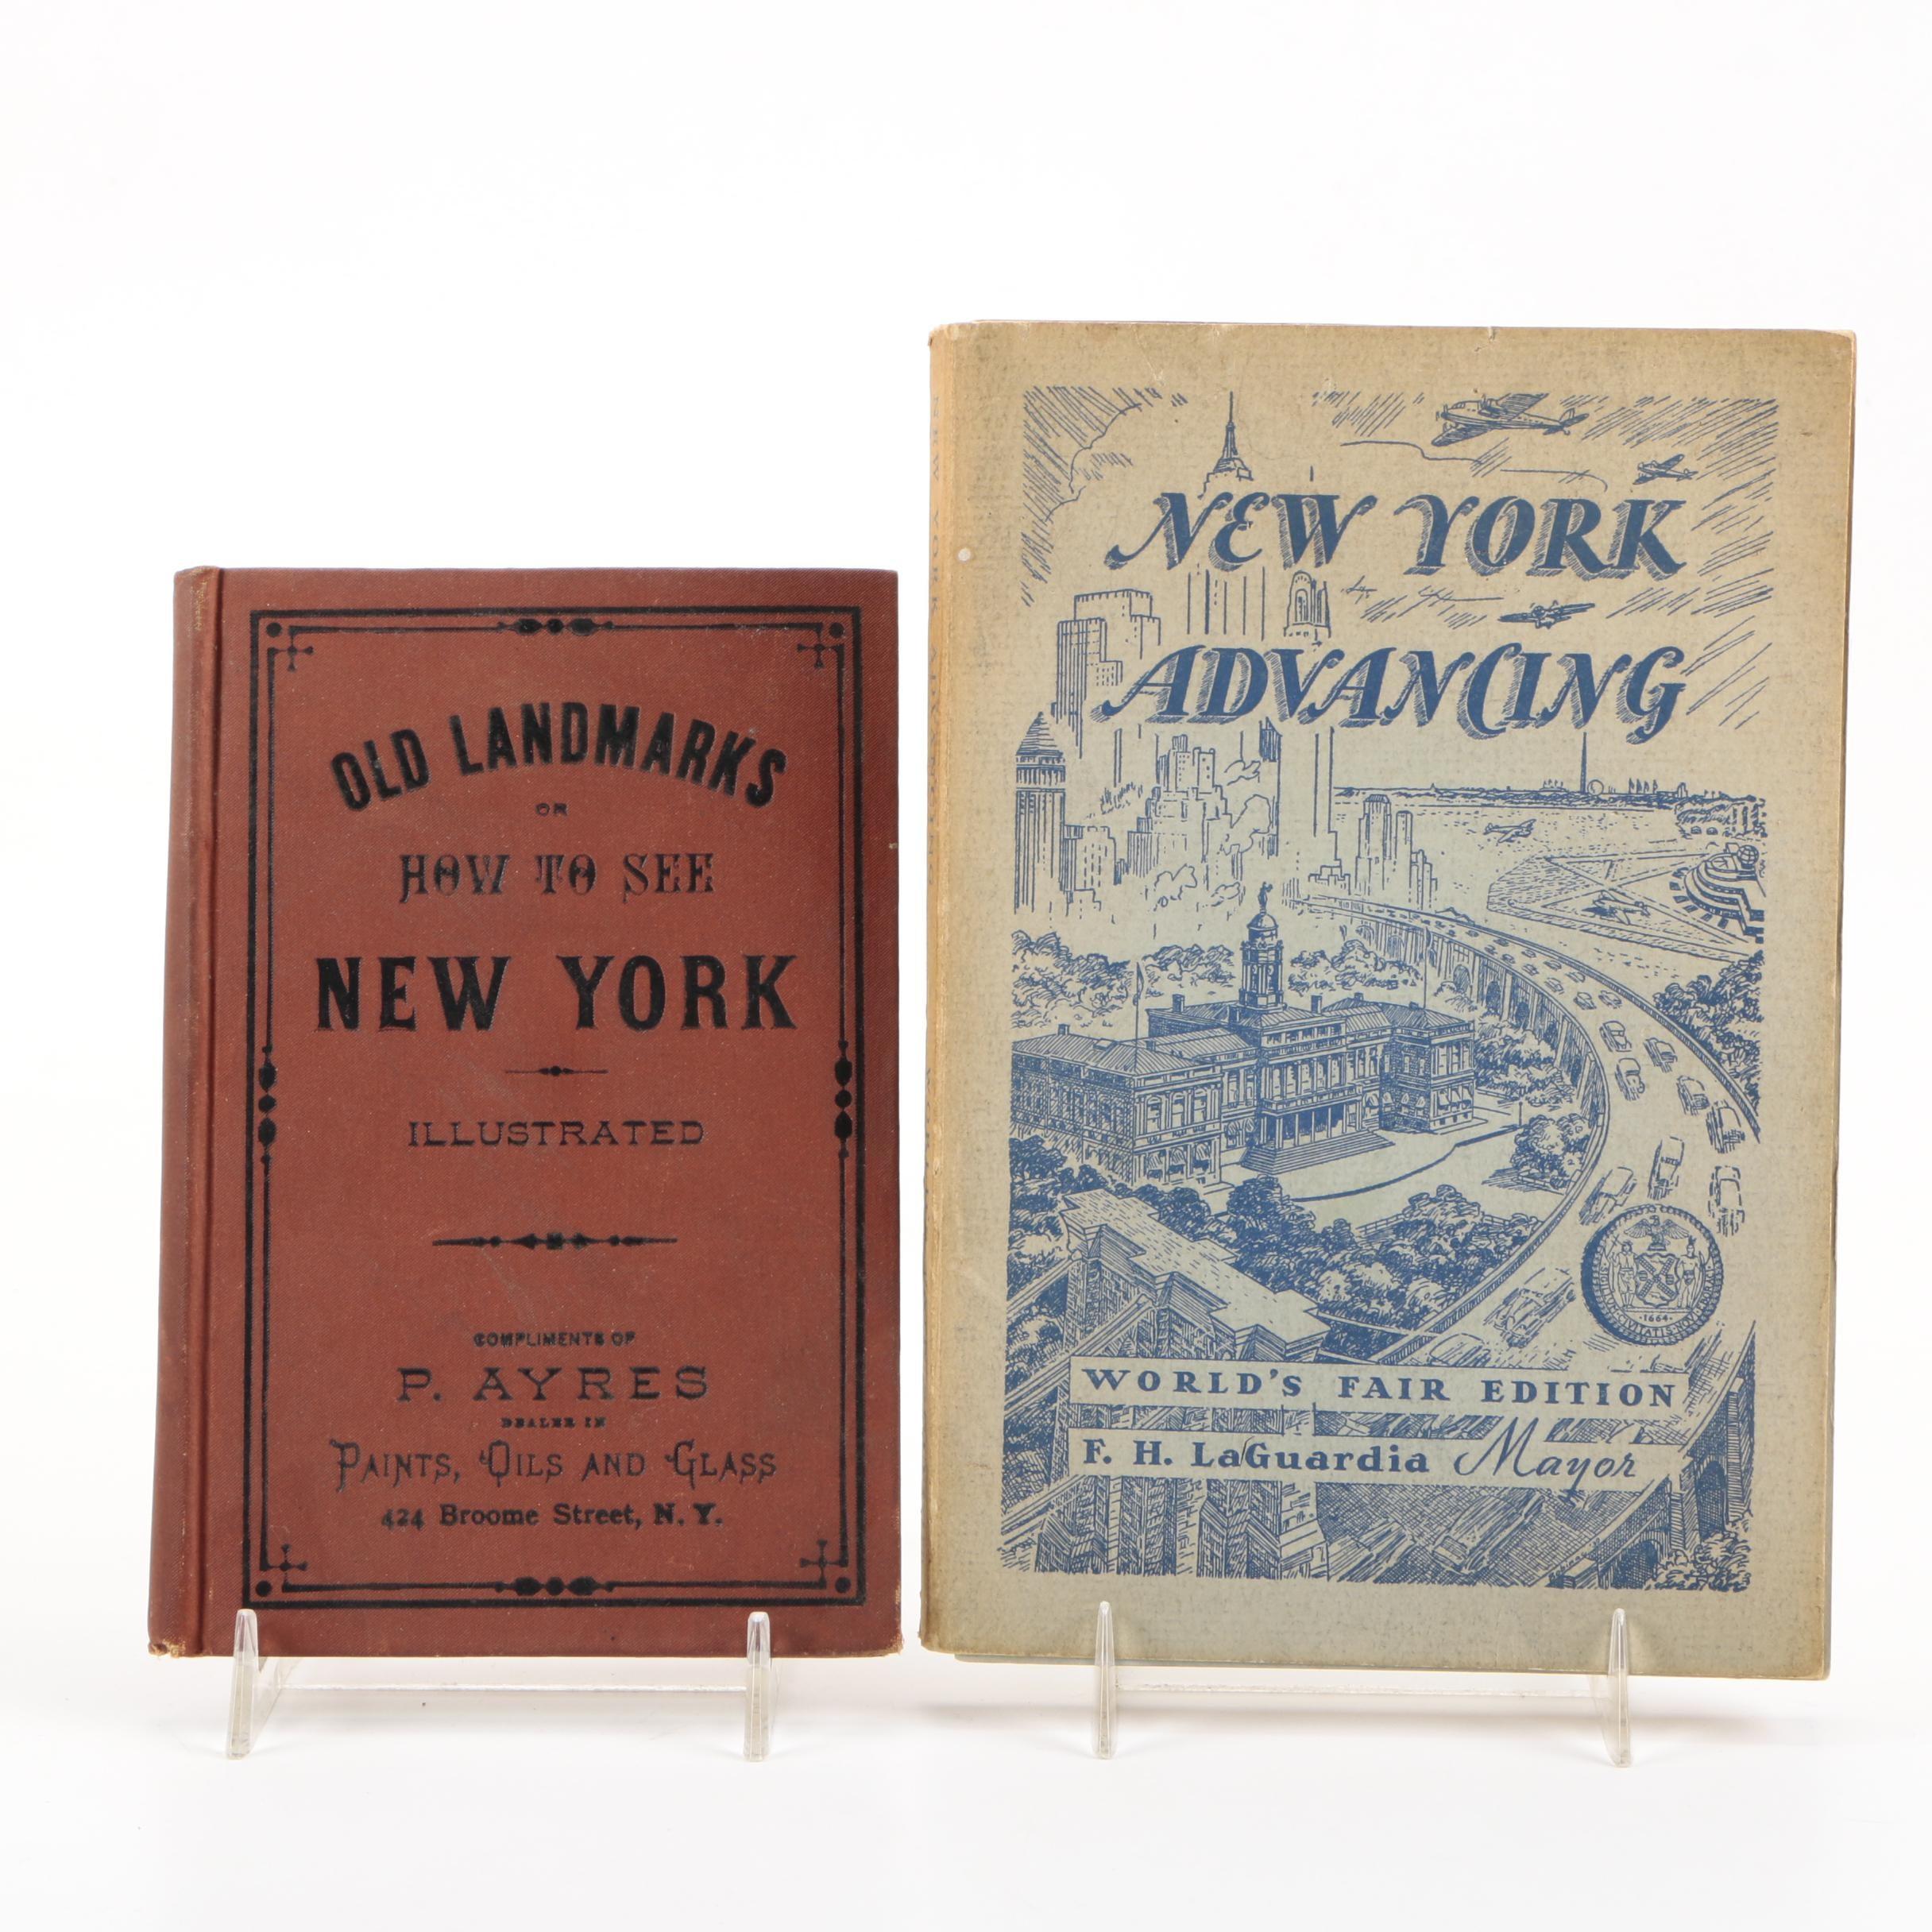 Pair of Books on New York Tourism